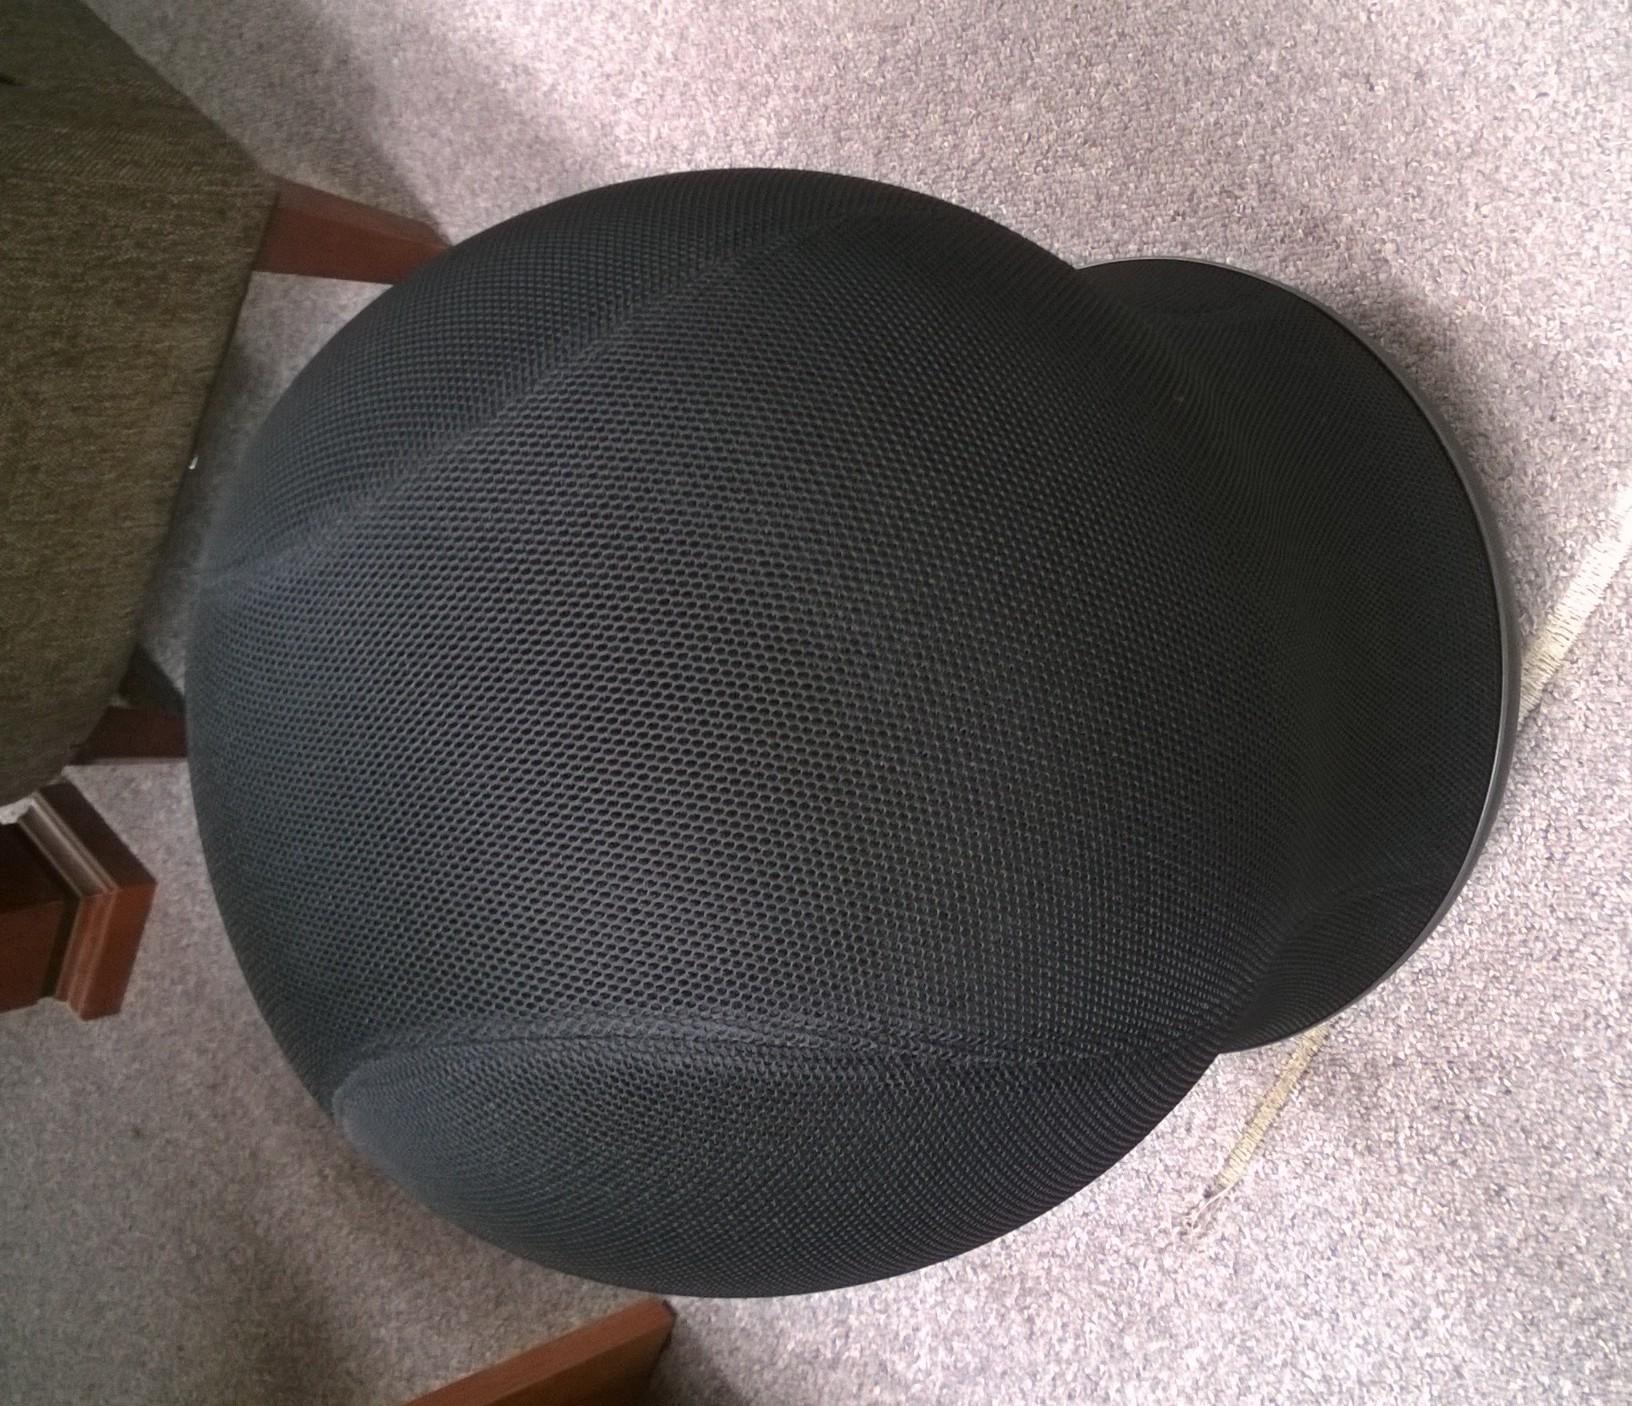 Chairs ZENERGY Z4760FJ SWIVEL CHAIR